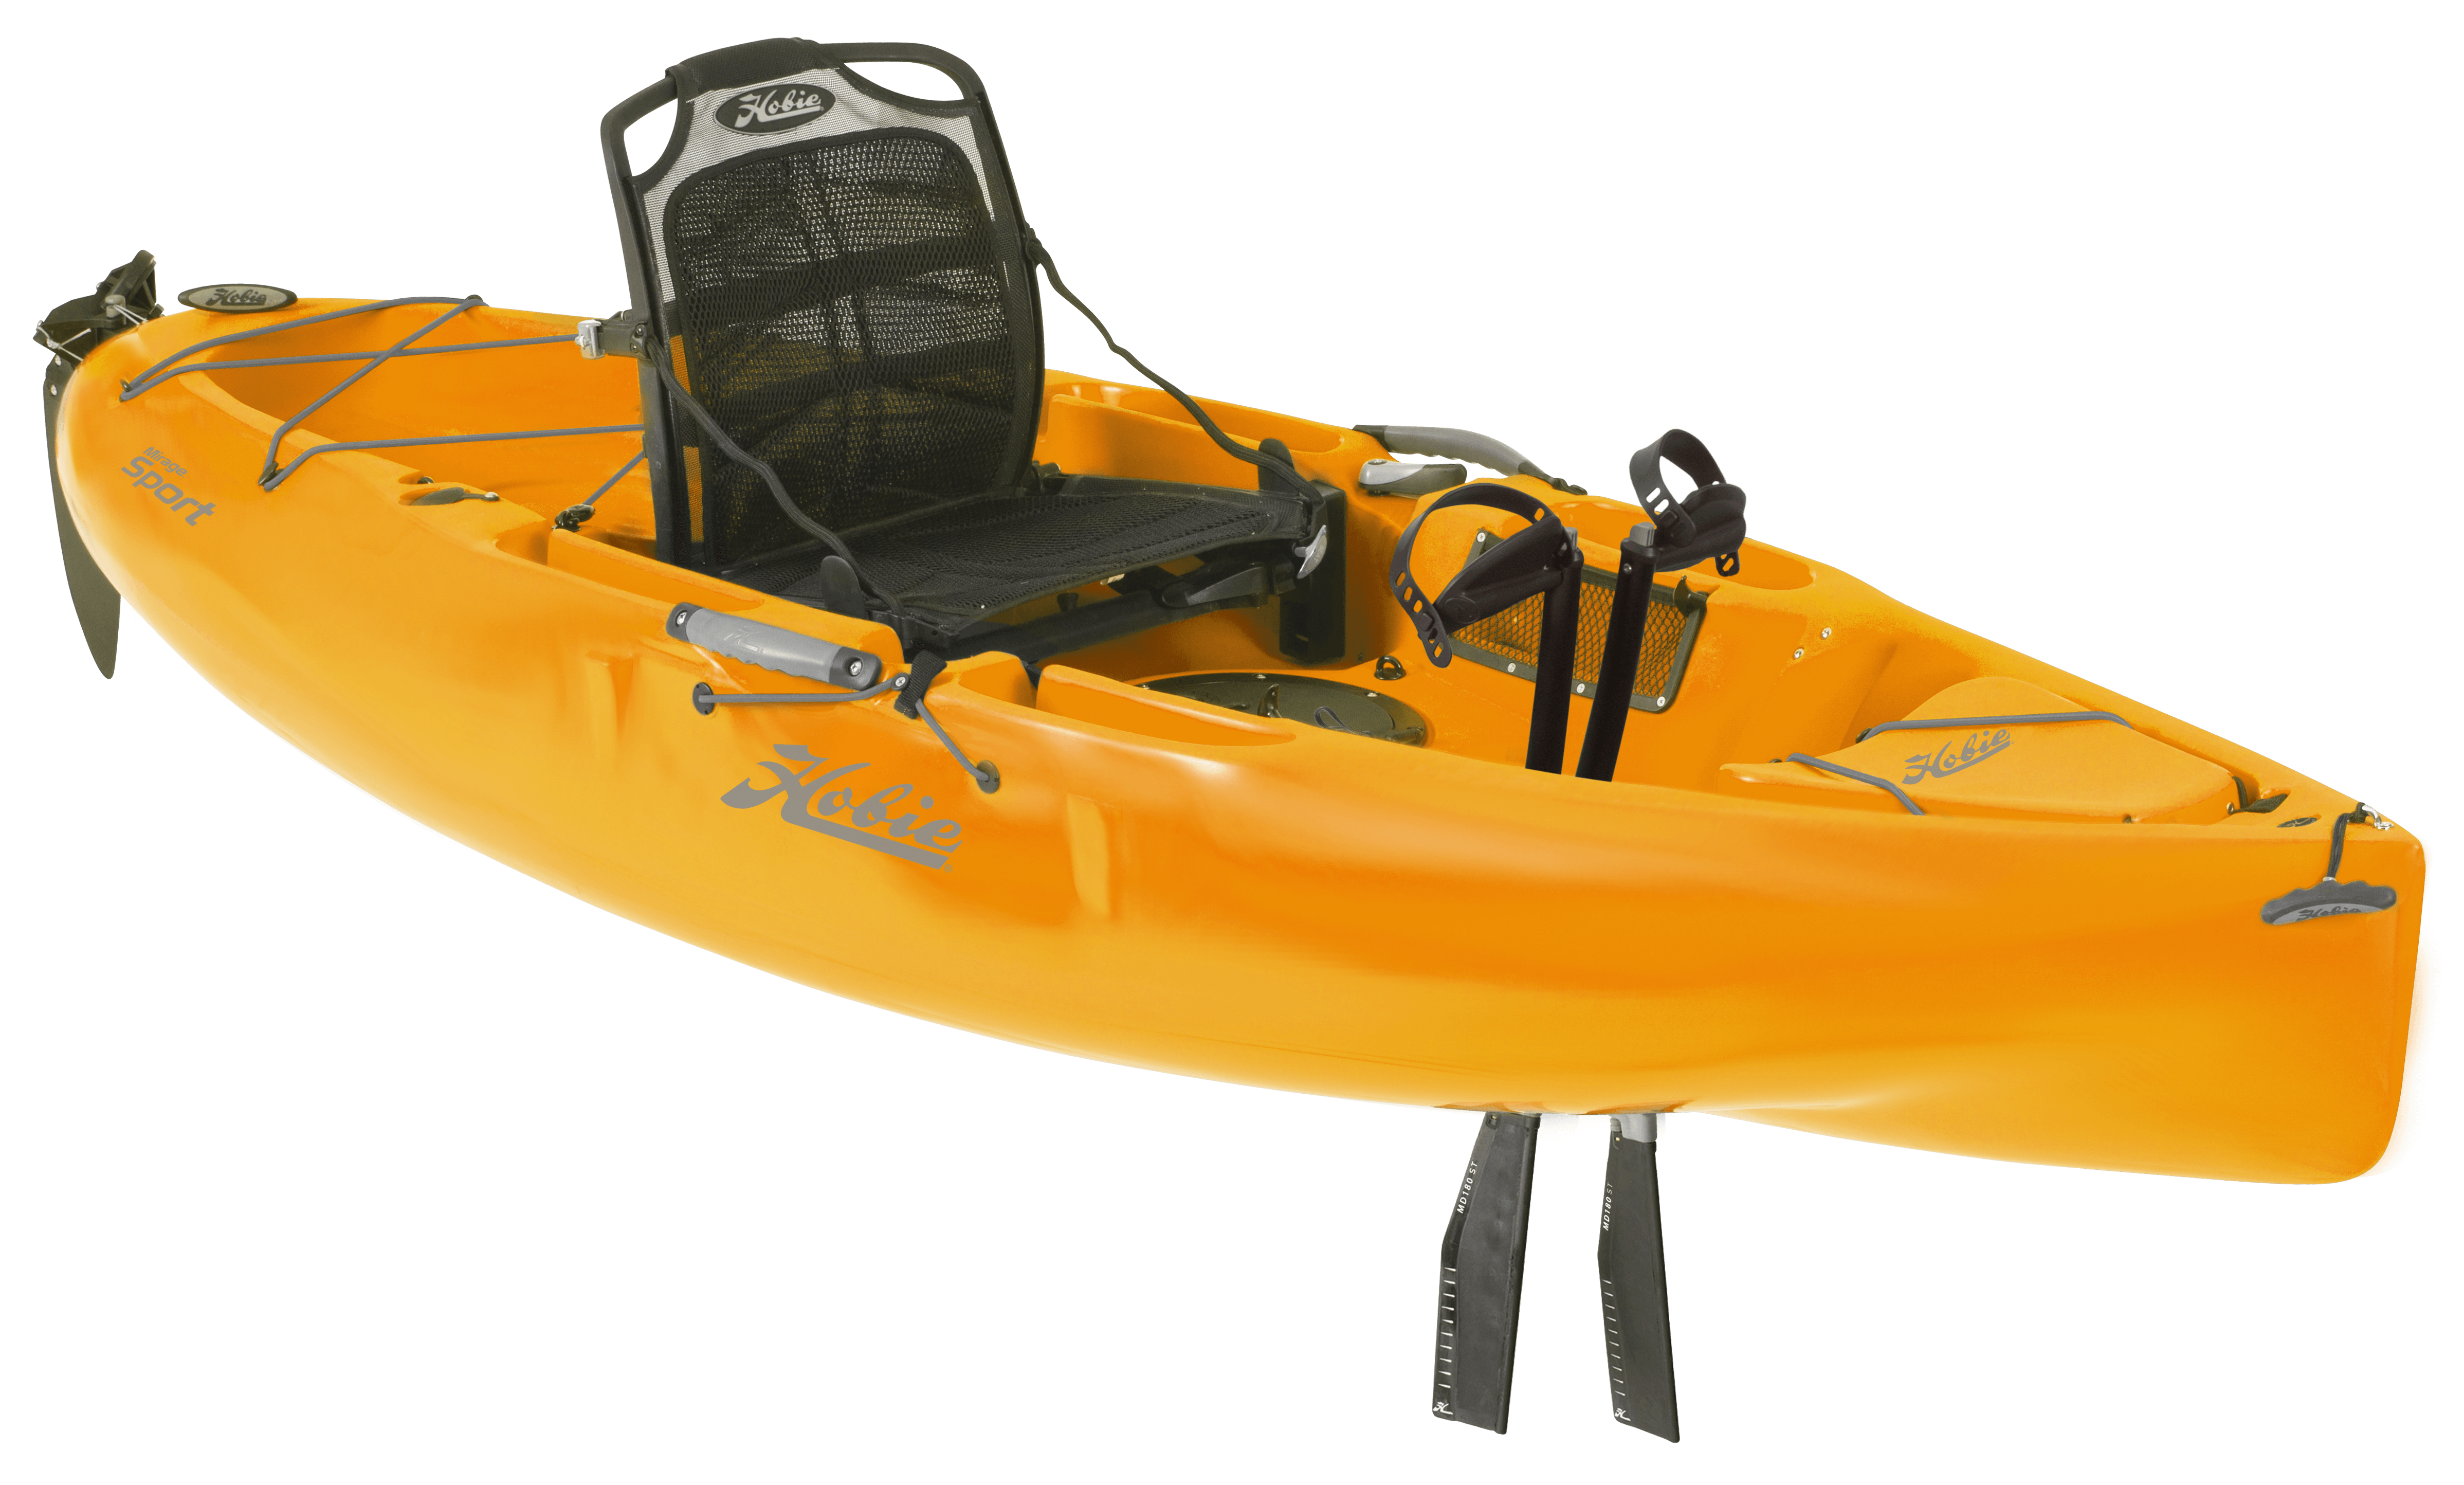 Hobie Sport Used Kayaks For Sale Used Kayaks Pedal Fishing Kayak